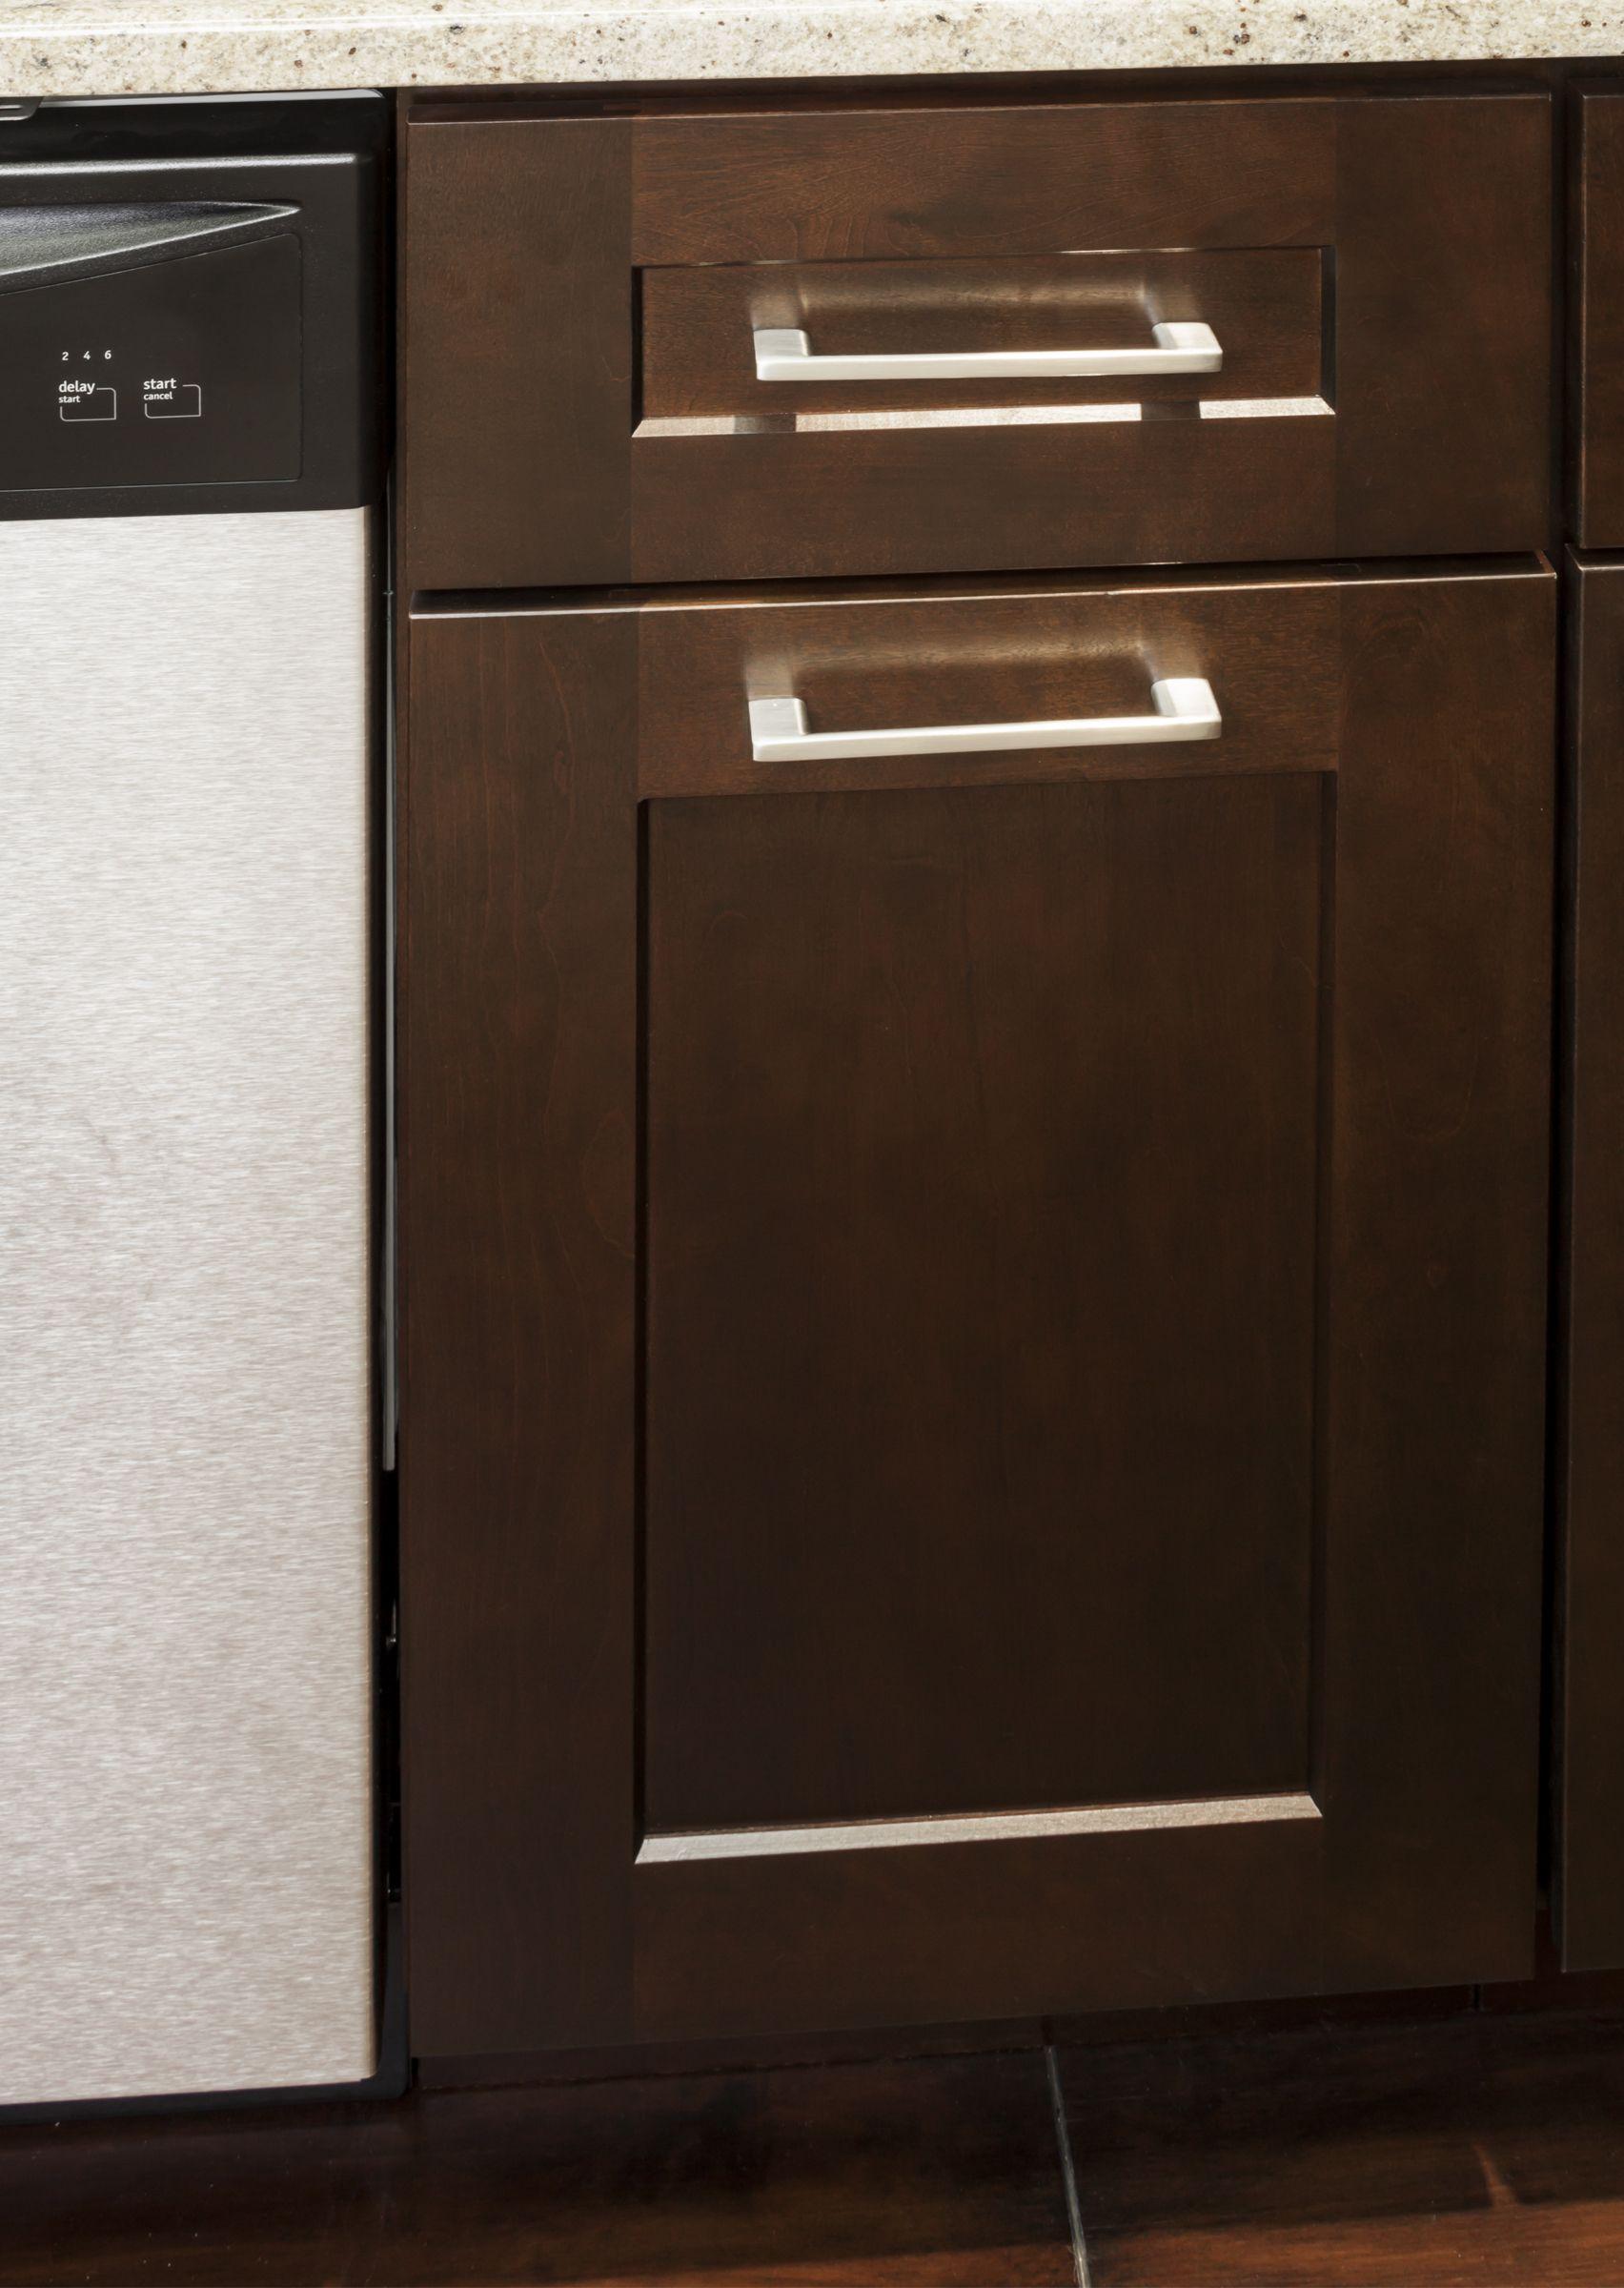 Sutton Cabinet Pulls From Jeffrey Alexander By Hardware